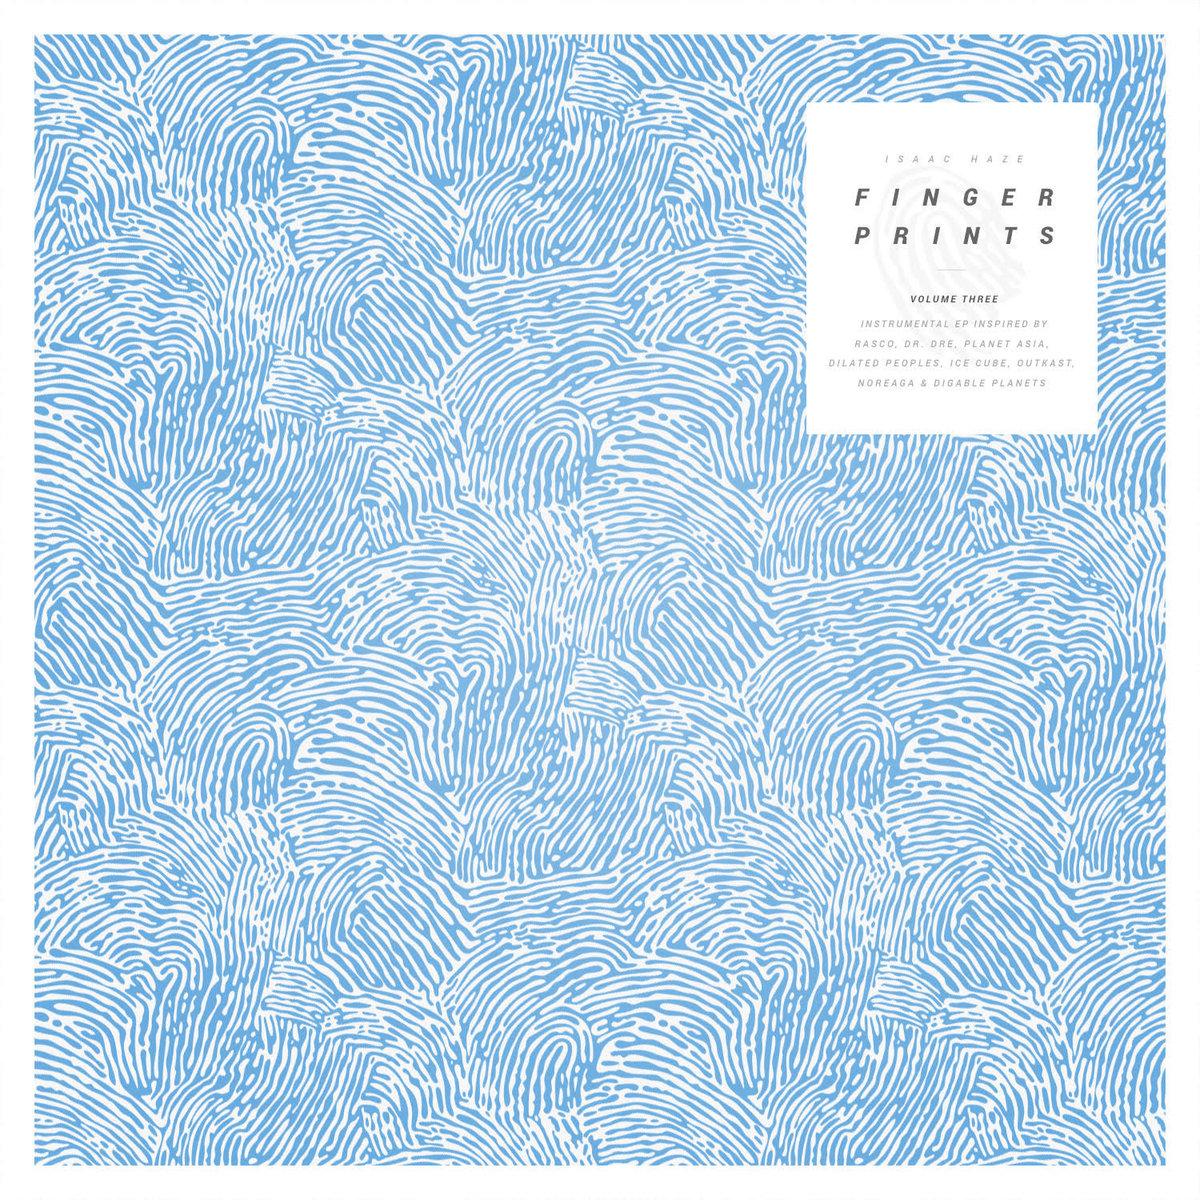 vinyl, beattape, full album stream, vinyltipp, albumtipp, hiphop beats, hiphop instrumental,  Fingerprints Vol. 3 von Isaac Haze im Full Album Stream